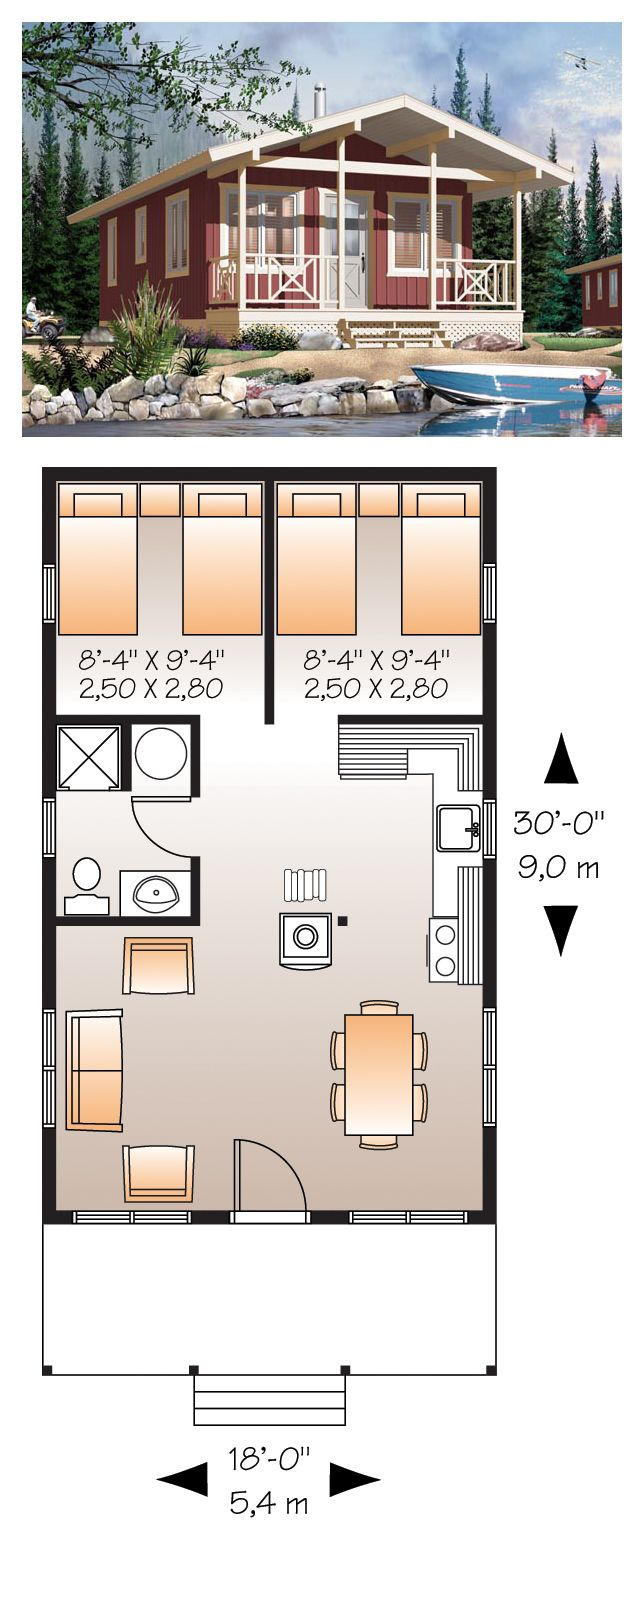 Tiny Home Designs: Narrow Lot House Plan 76167